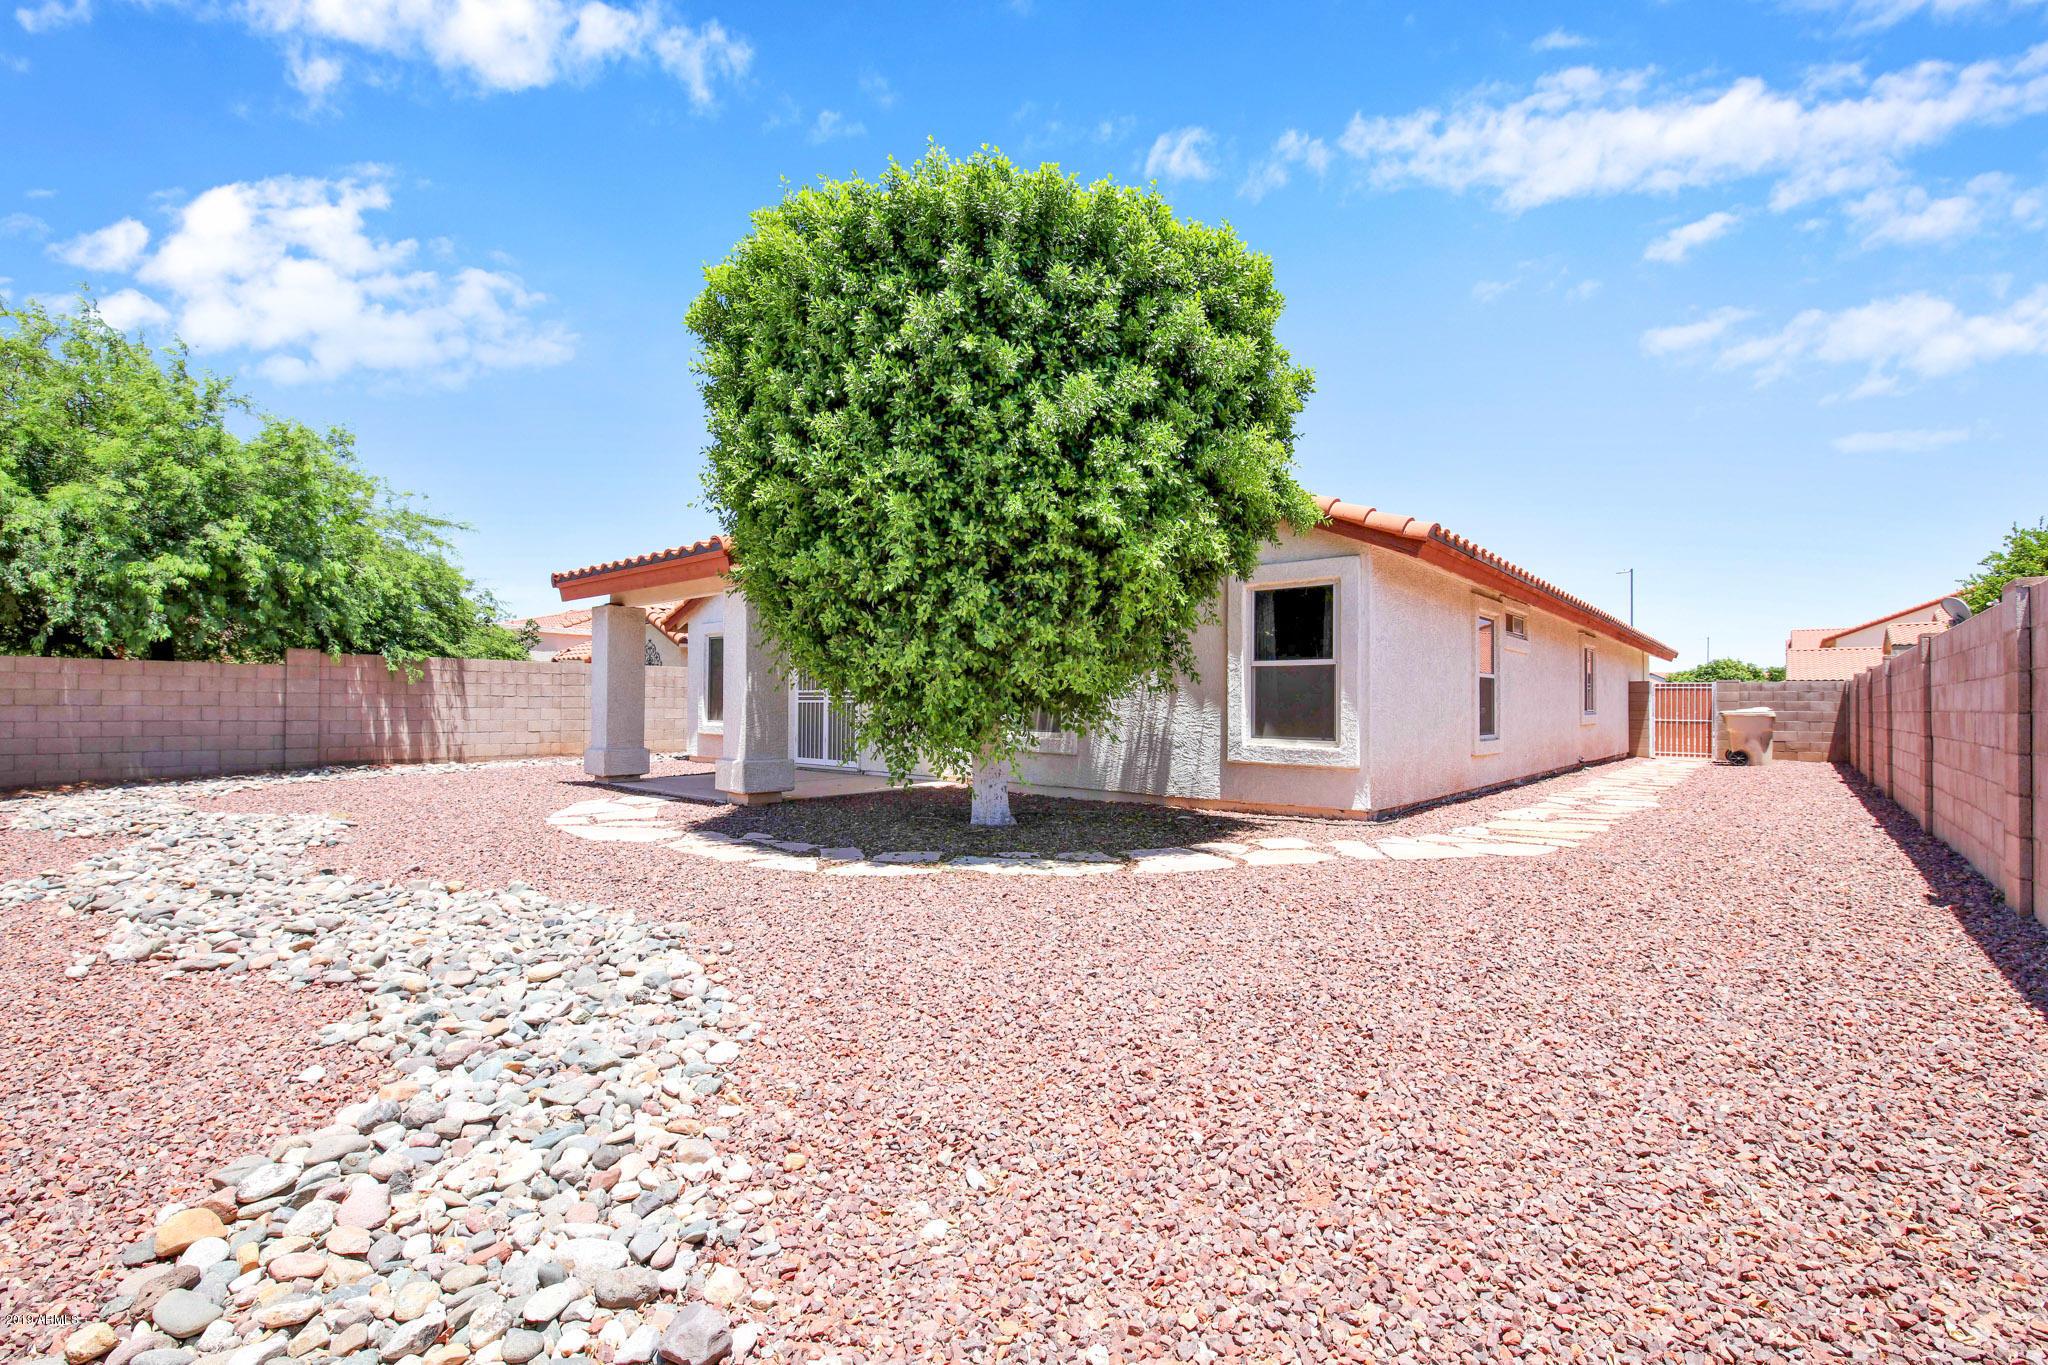 MLS 5961083 12752 N 58TH Drive, Glendale, AZ 85304 Glendale AZ North Glendale